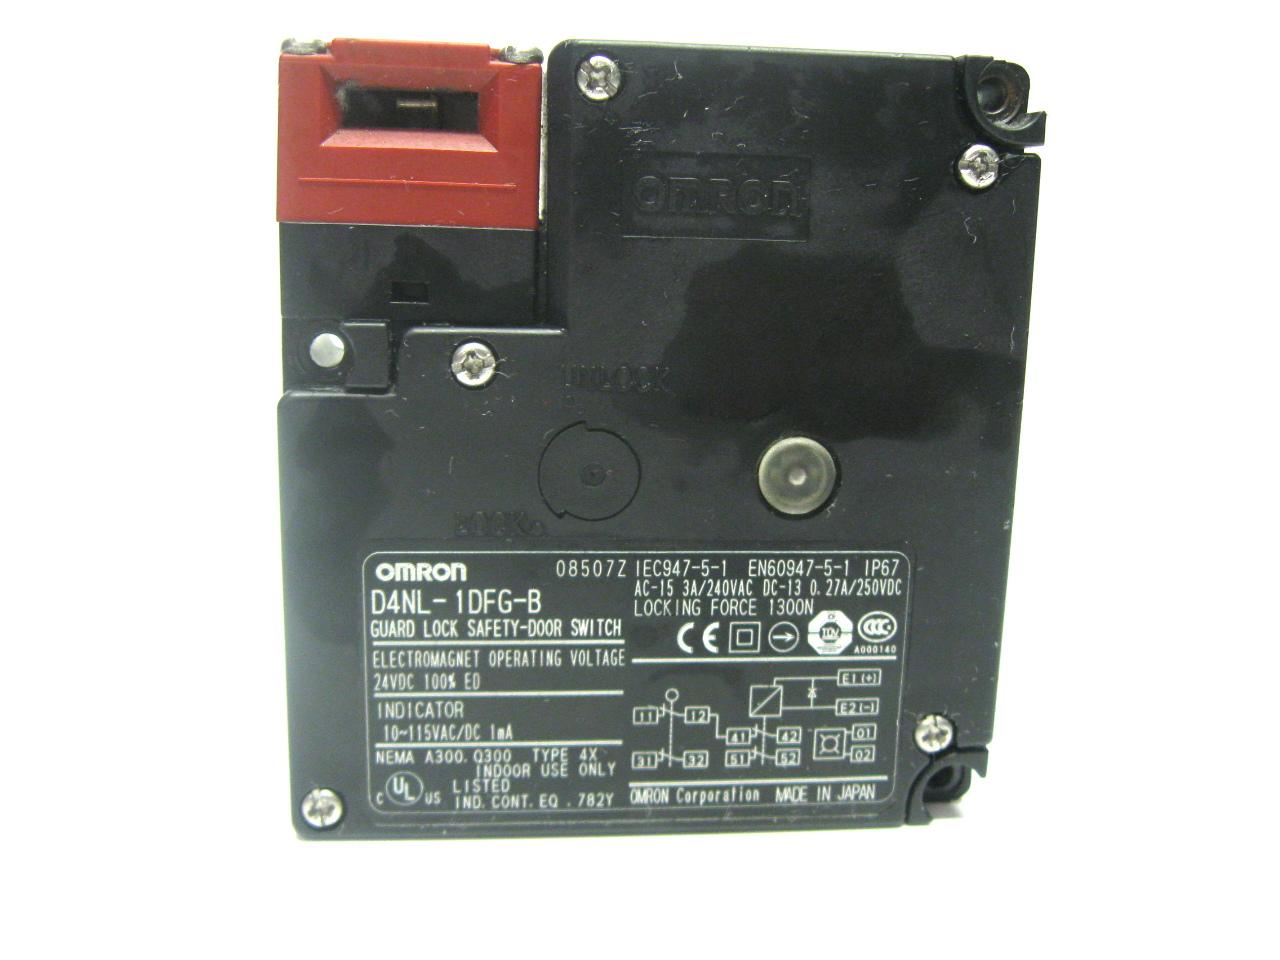 Door Switch Safety : Omron d nl dfg b guard lock safety door switch vdc ebay